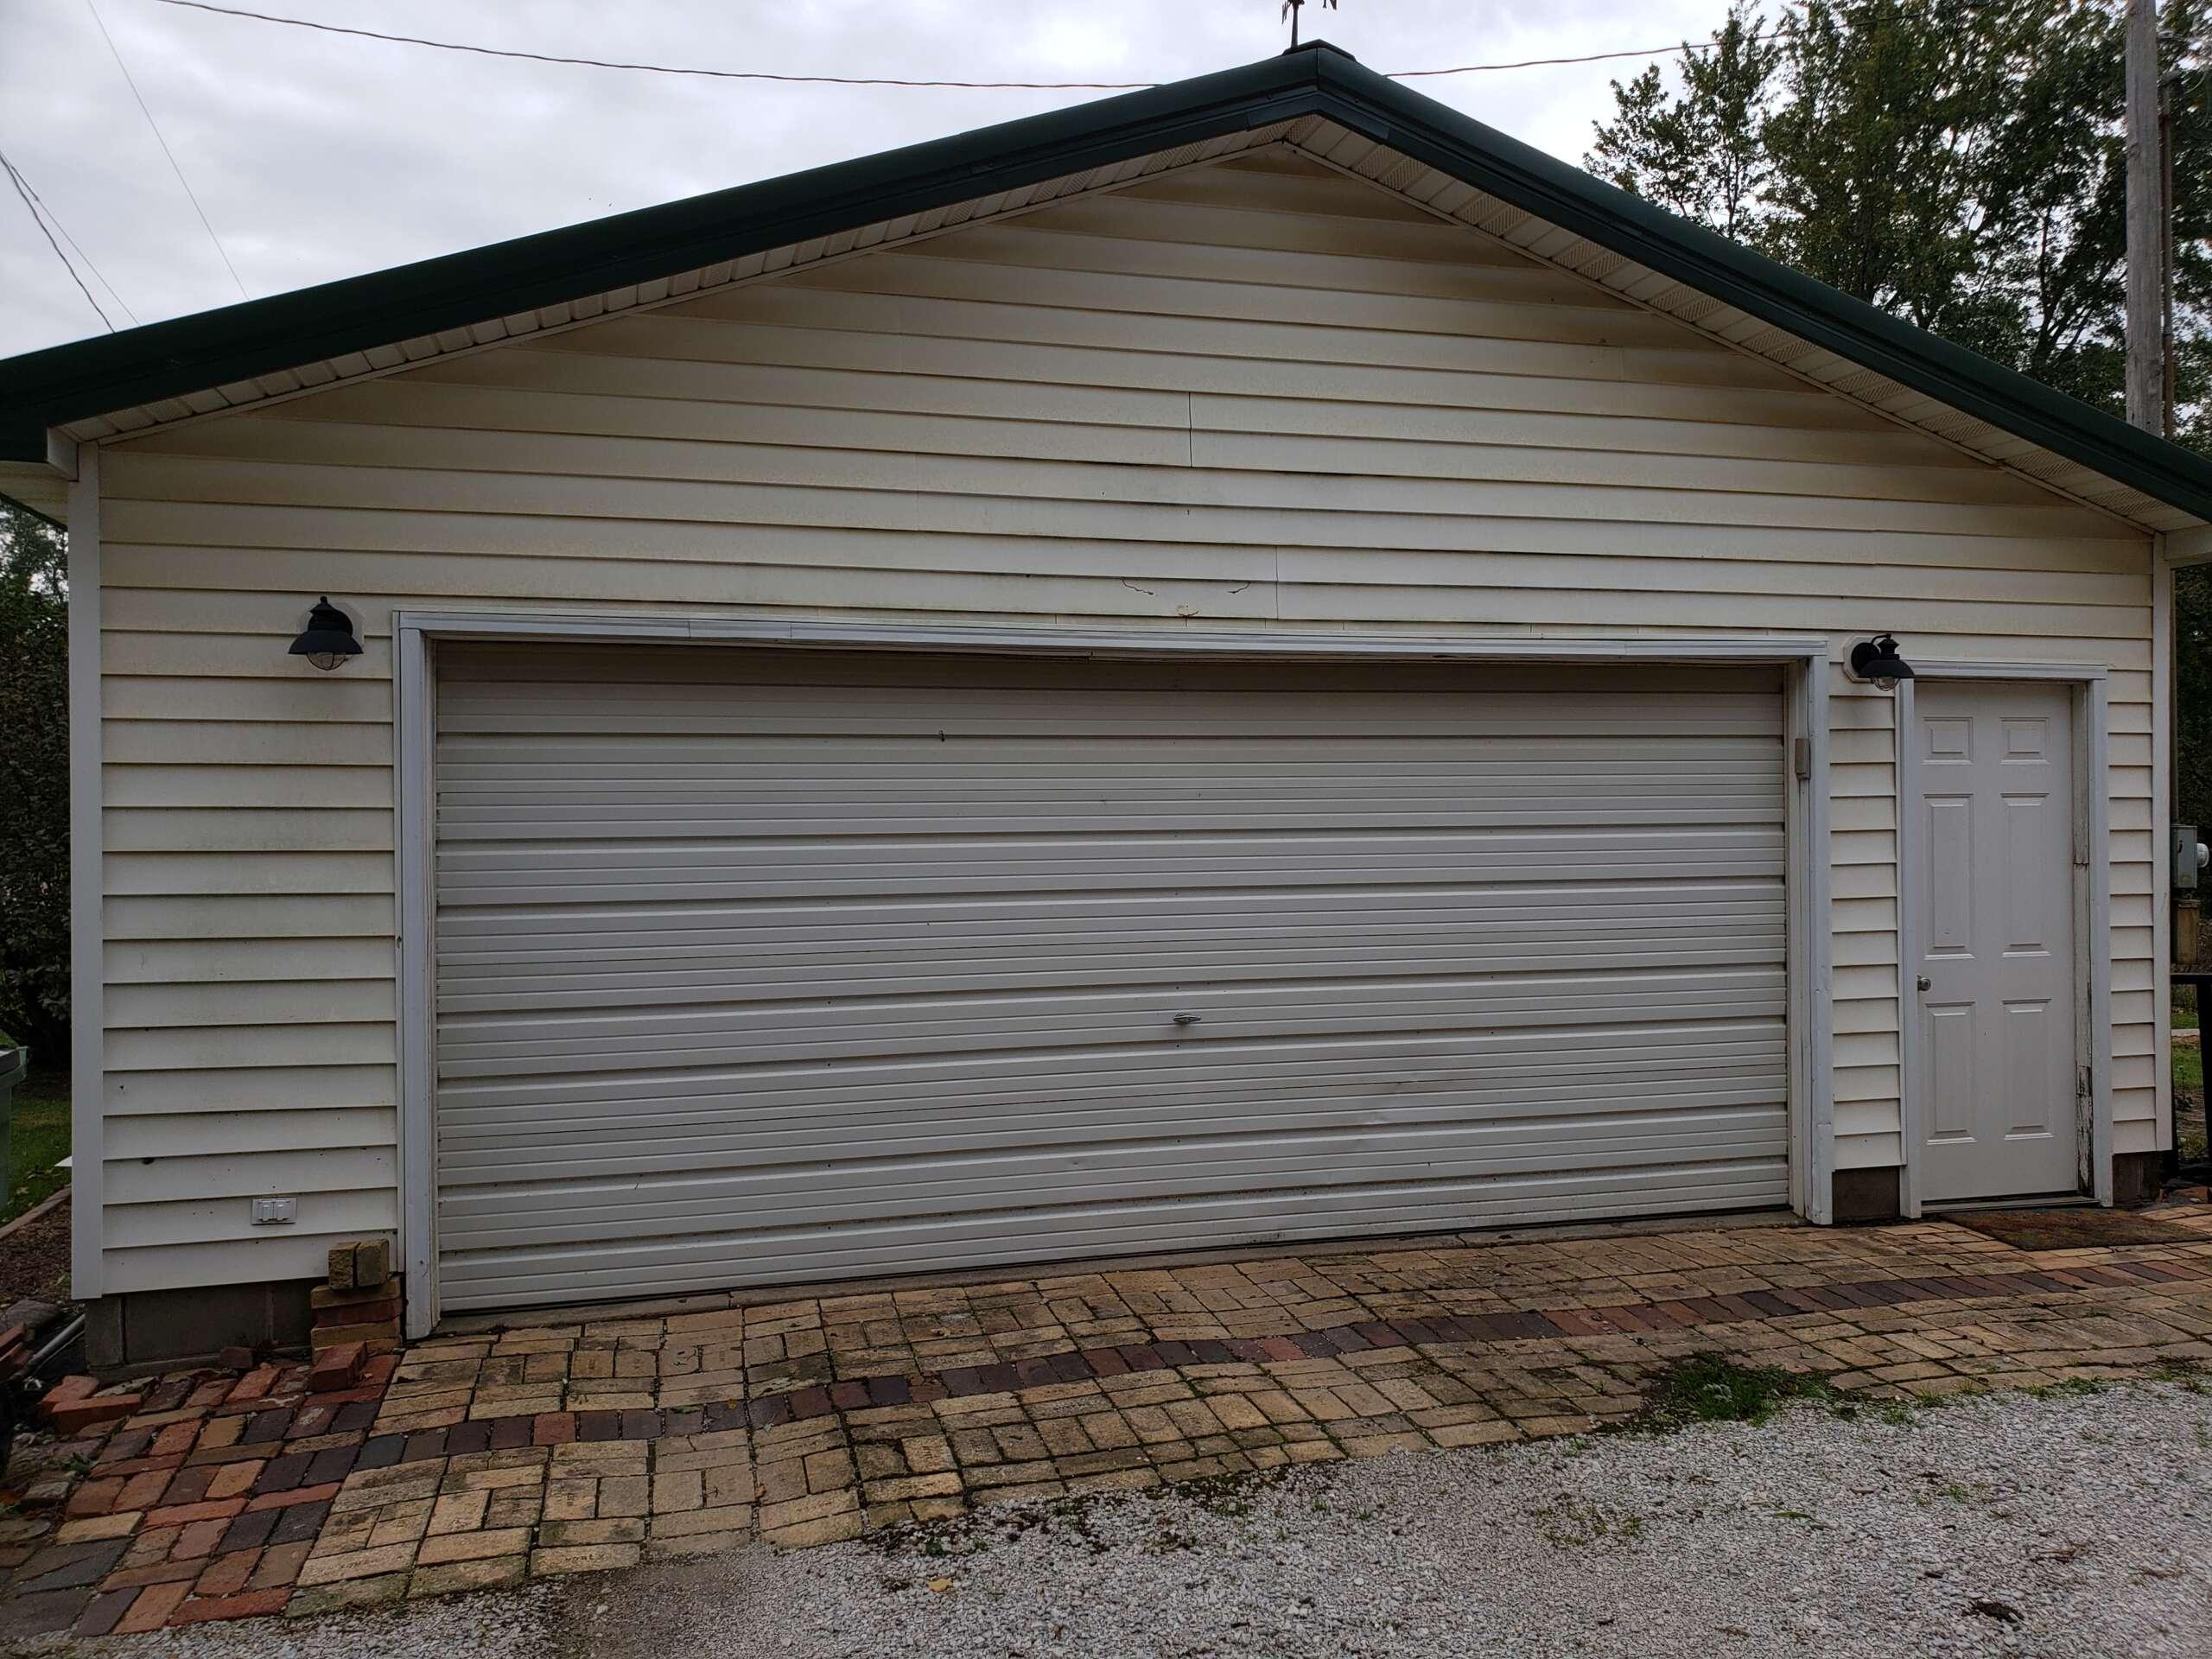 Before paitning front of garage